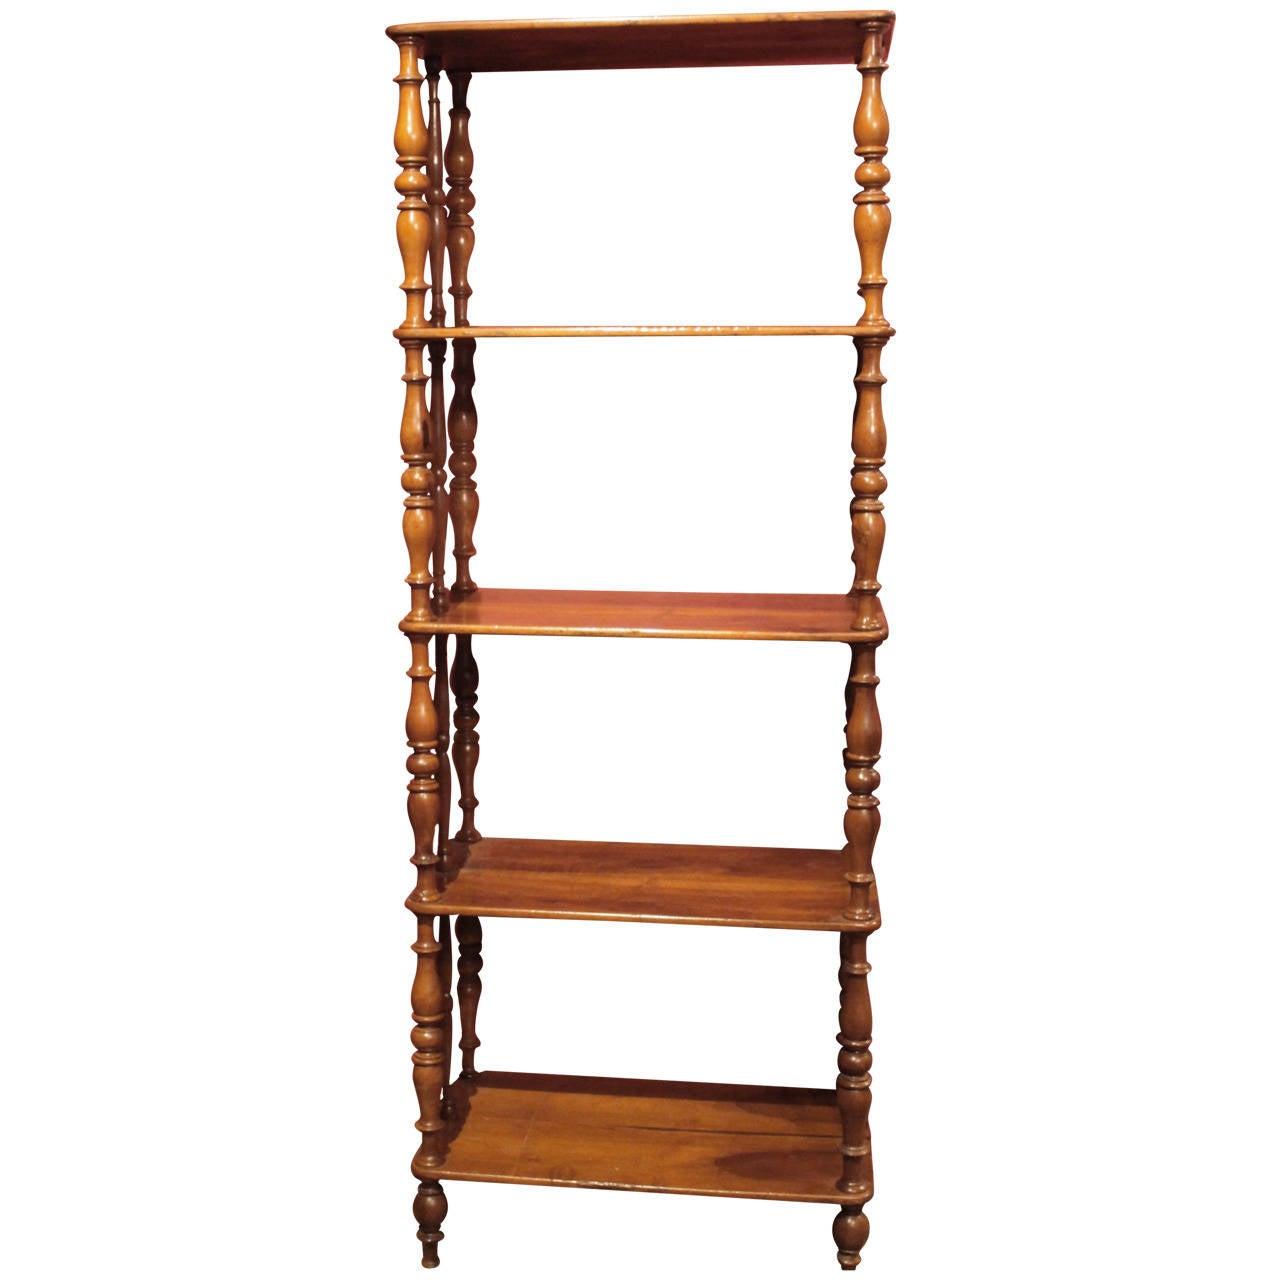 Italian 19th Century Walnut Wood Étagère or Bookcase 1